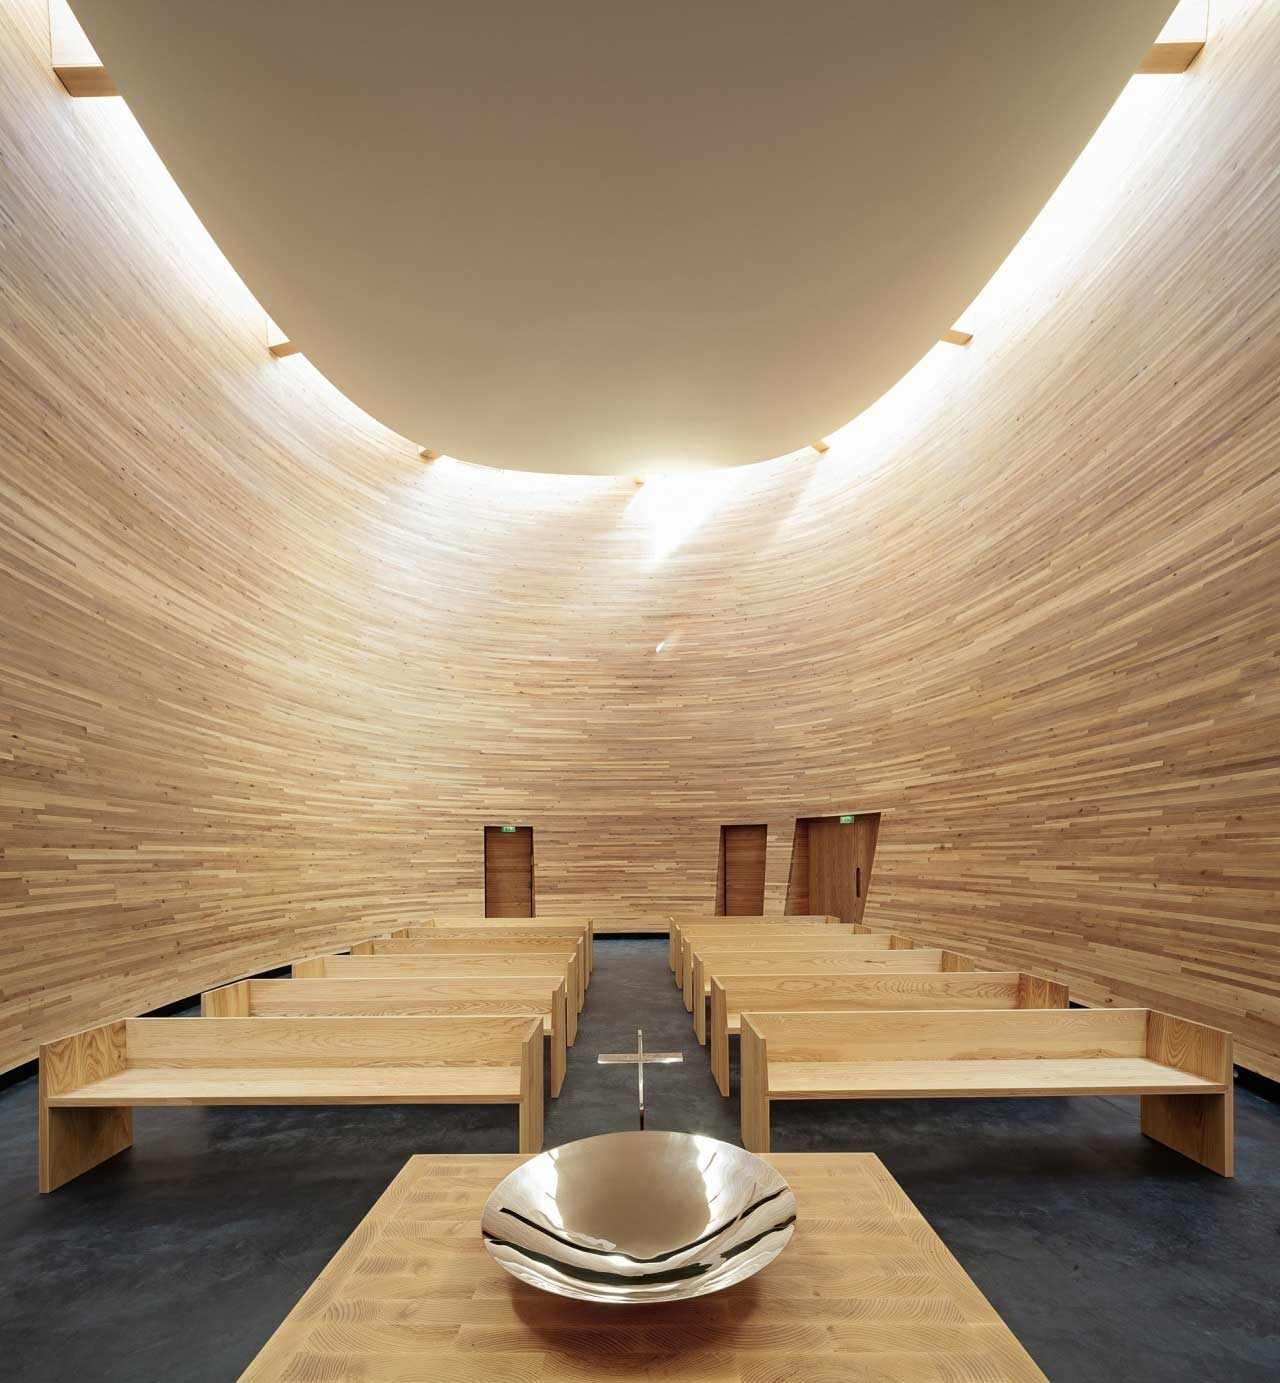 Kamppi Chapel: a Silent Break From Urban Chaos